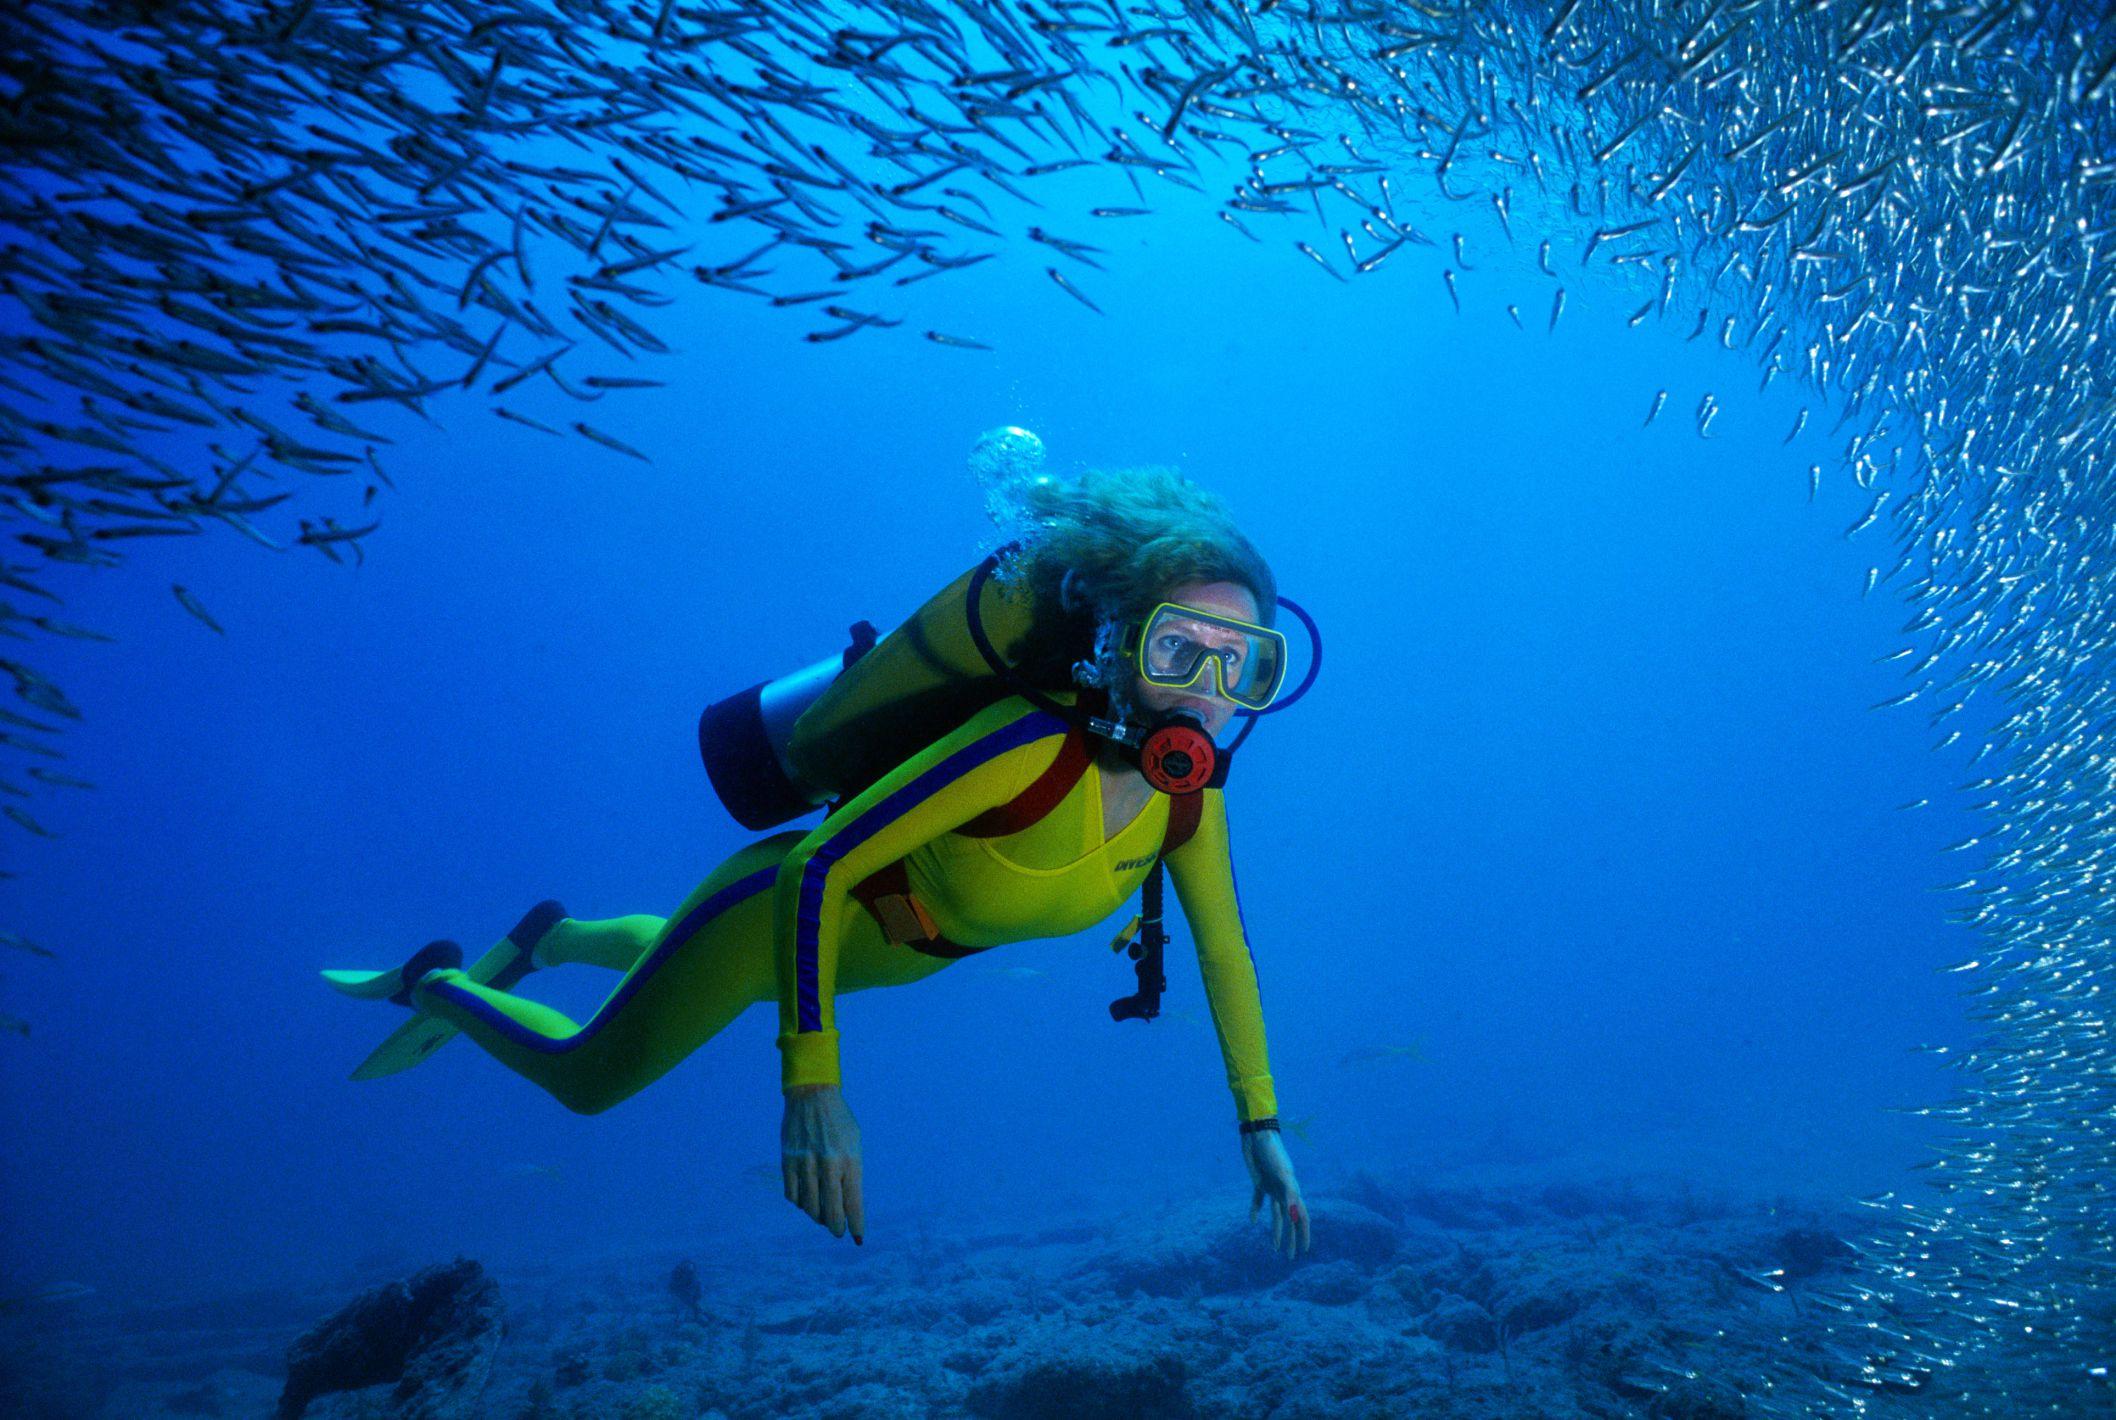 Seasickness While Scuba Diving